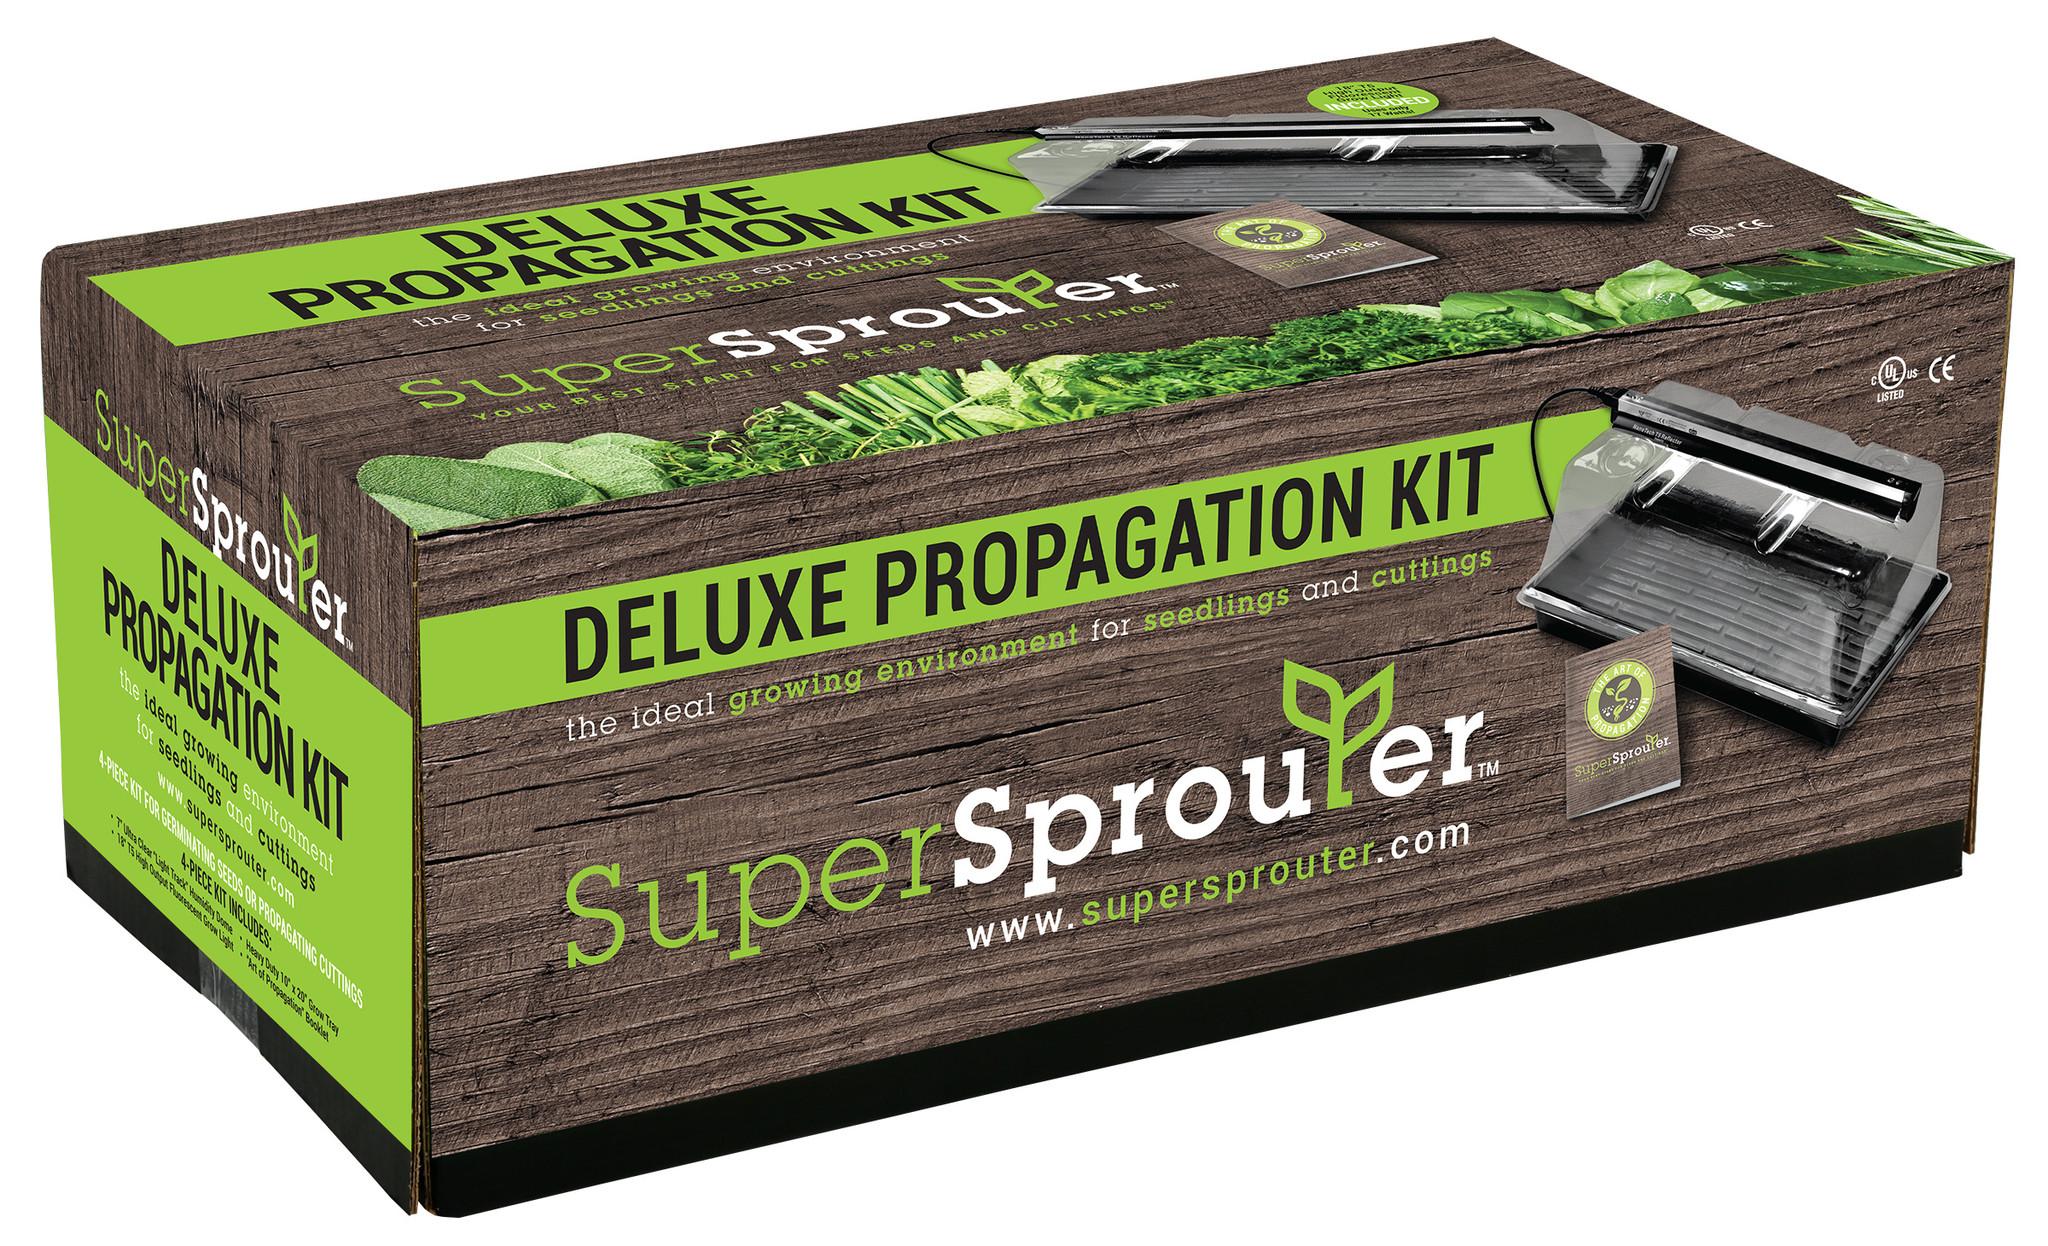 Deluxe Propagation Kit